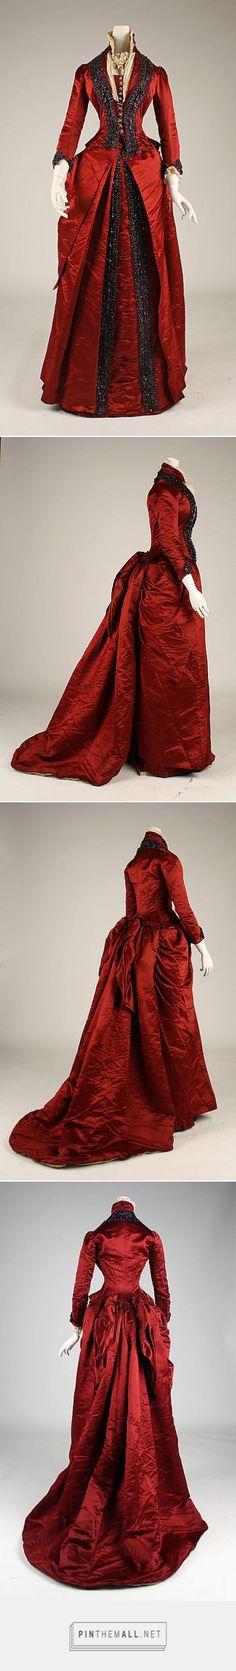 Dinner dress late 1870s American | The Metropolitan Museum of Art